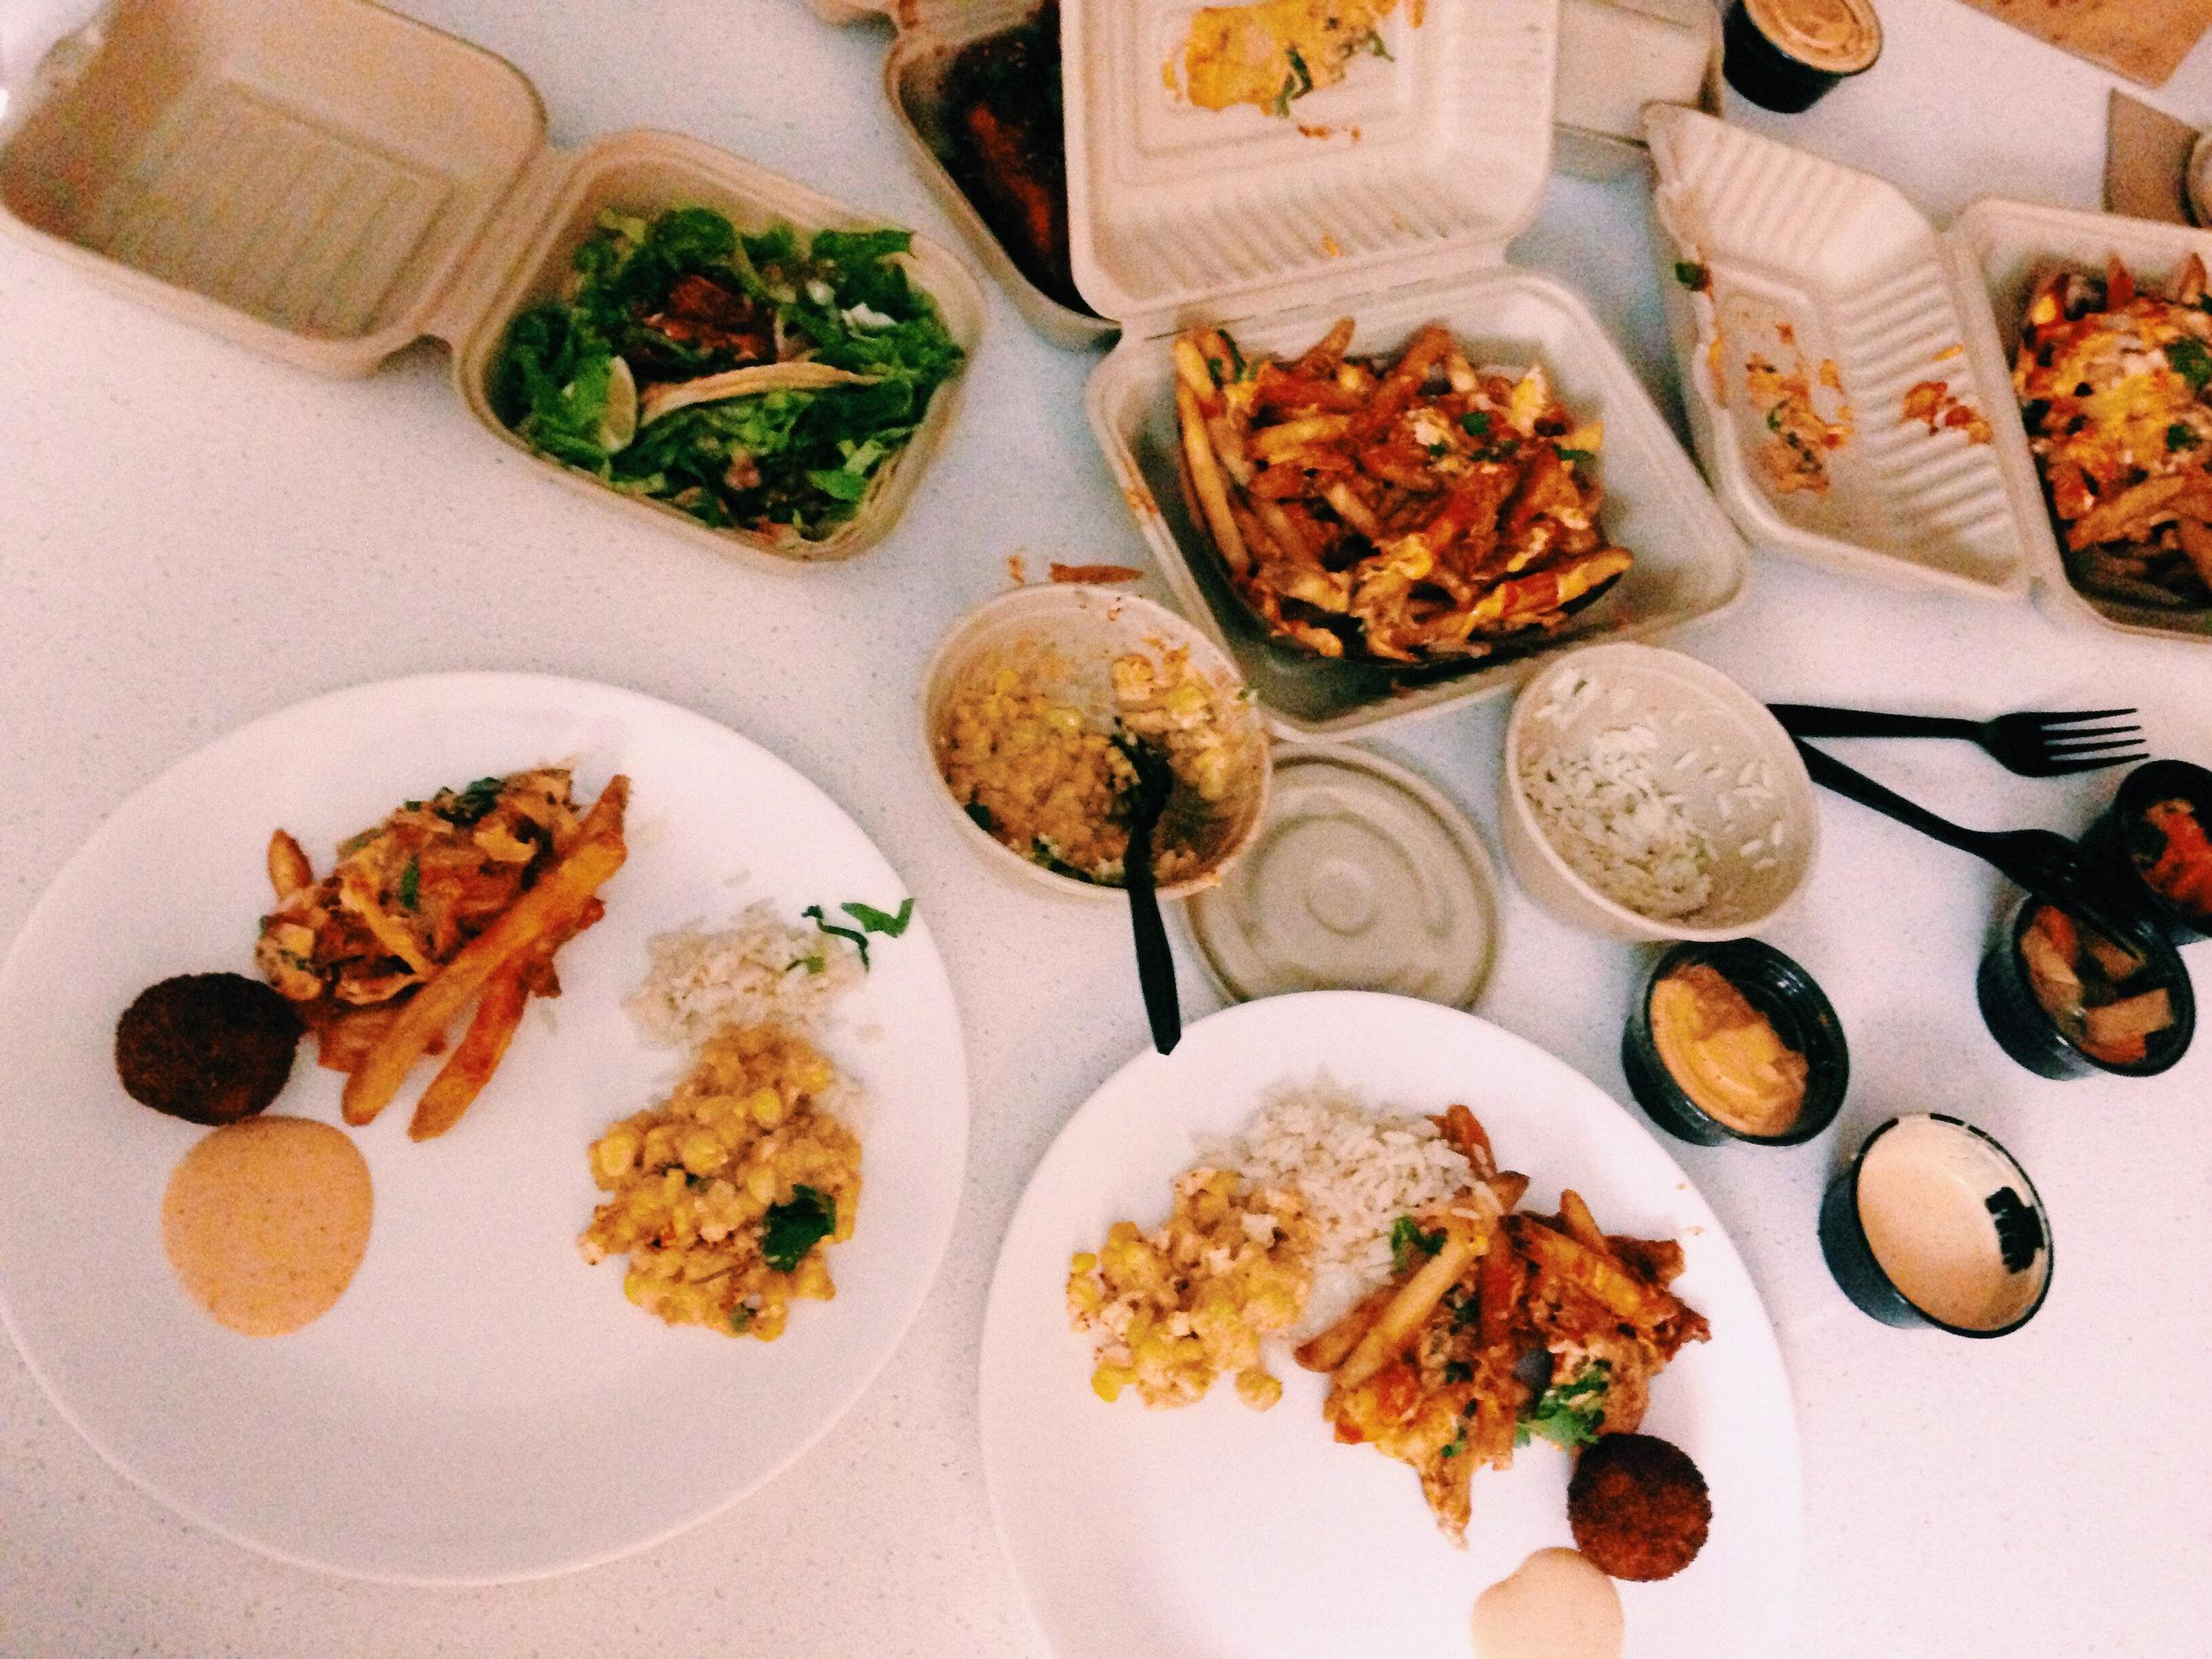 Food from Chi'lantro BBQ, Austin